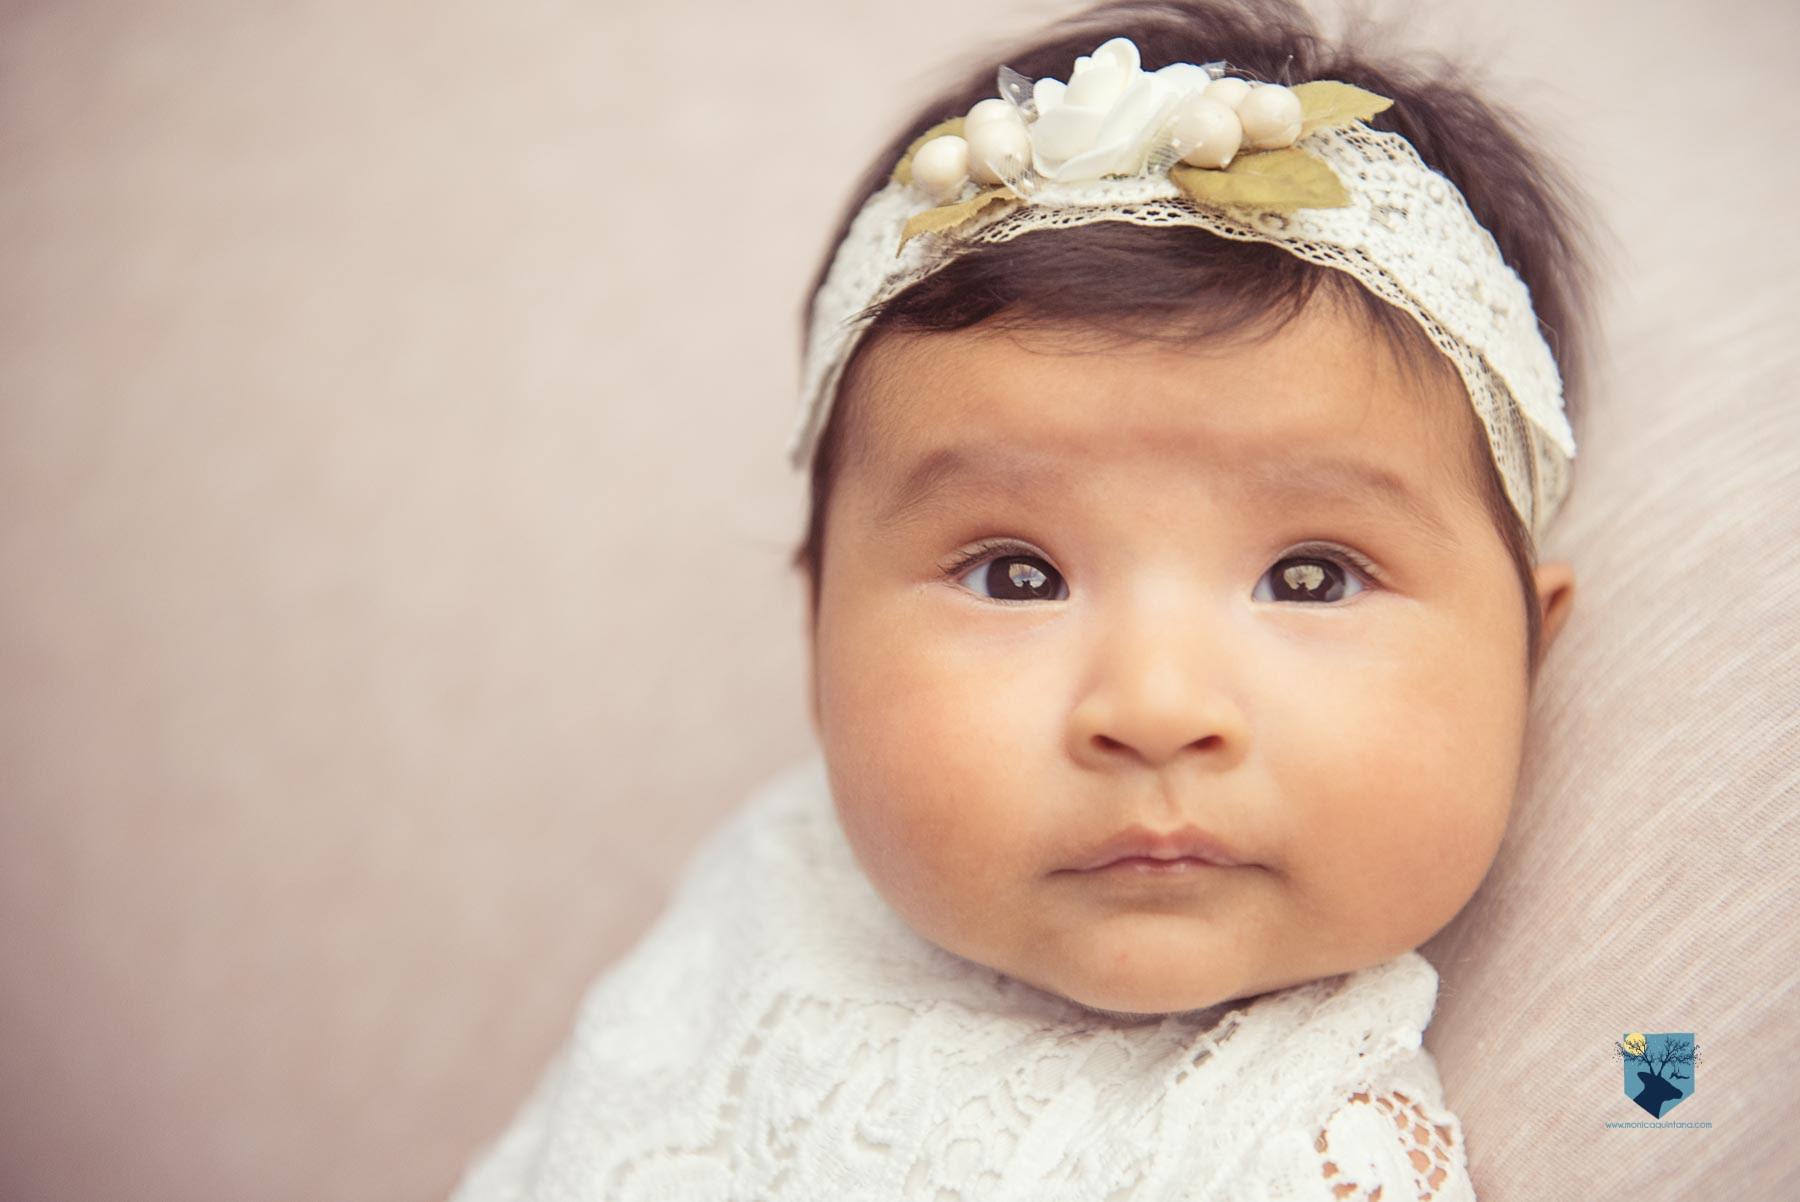 fotografia fotos girona figueres emporda monica quintana bebes niños familia retrato estudio 2 meses 1mes